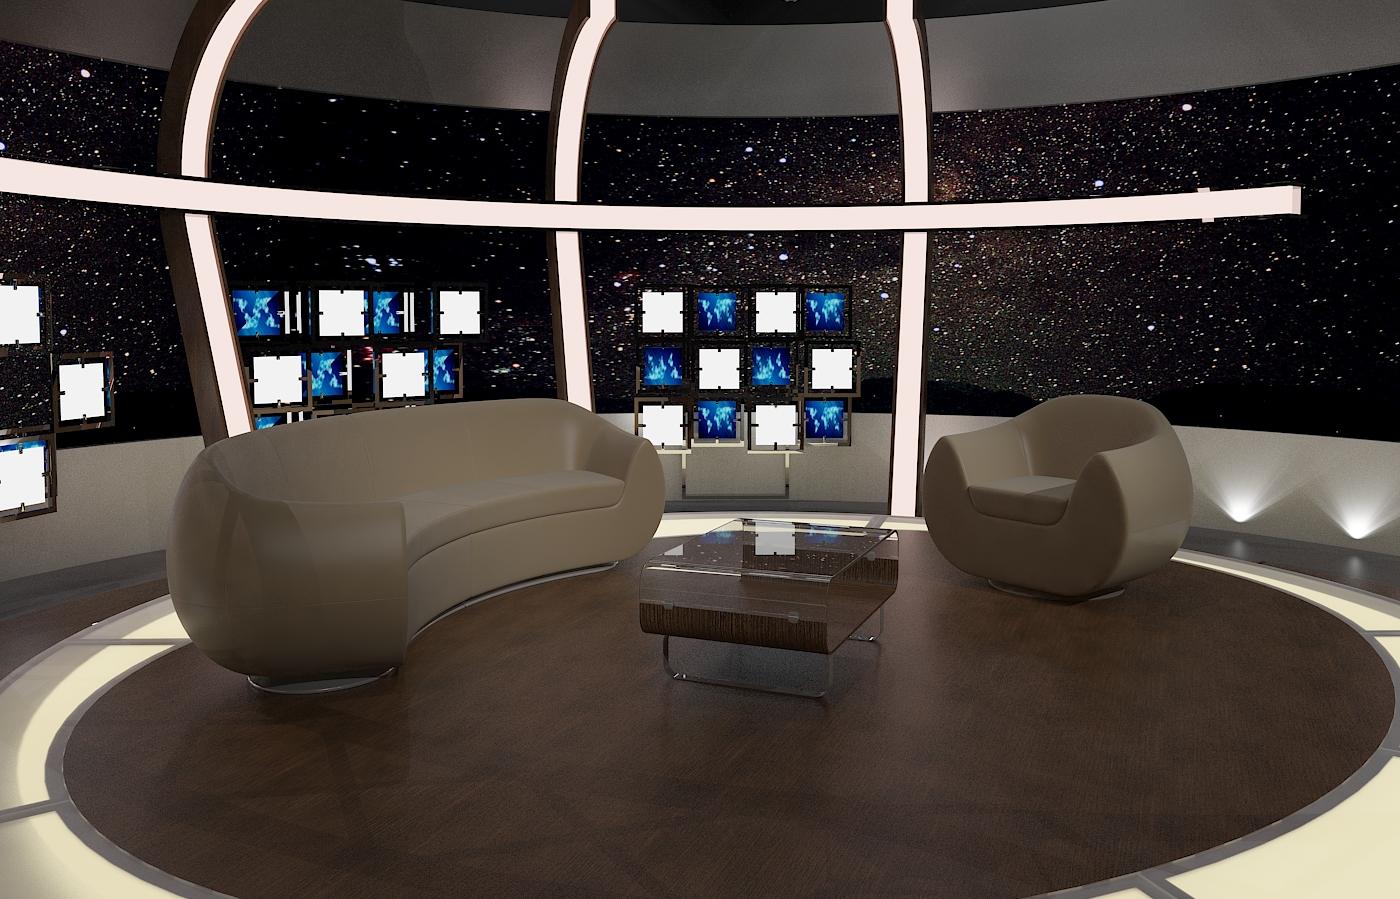 virtual tv chat set 20 3d model max dxf fbx obj 207148